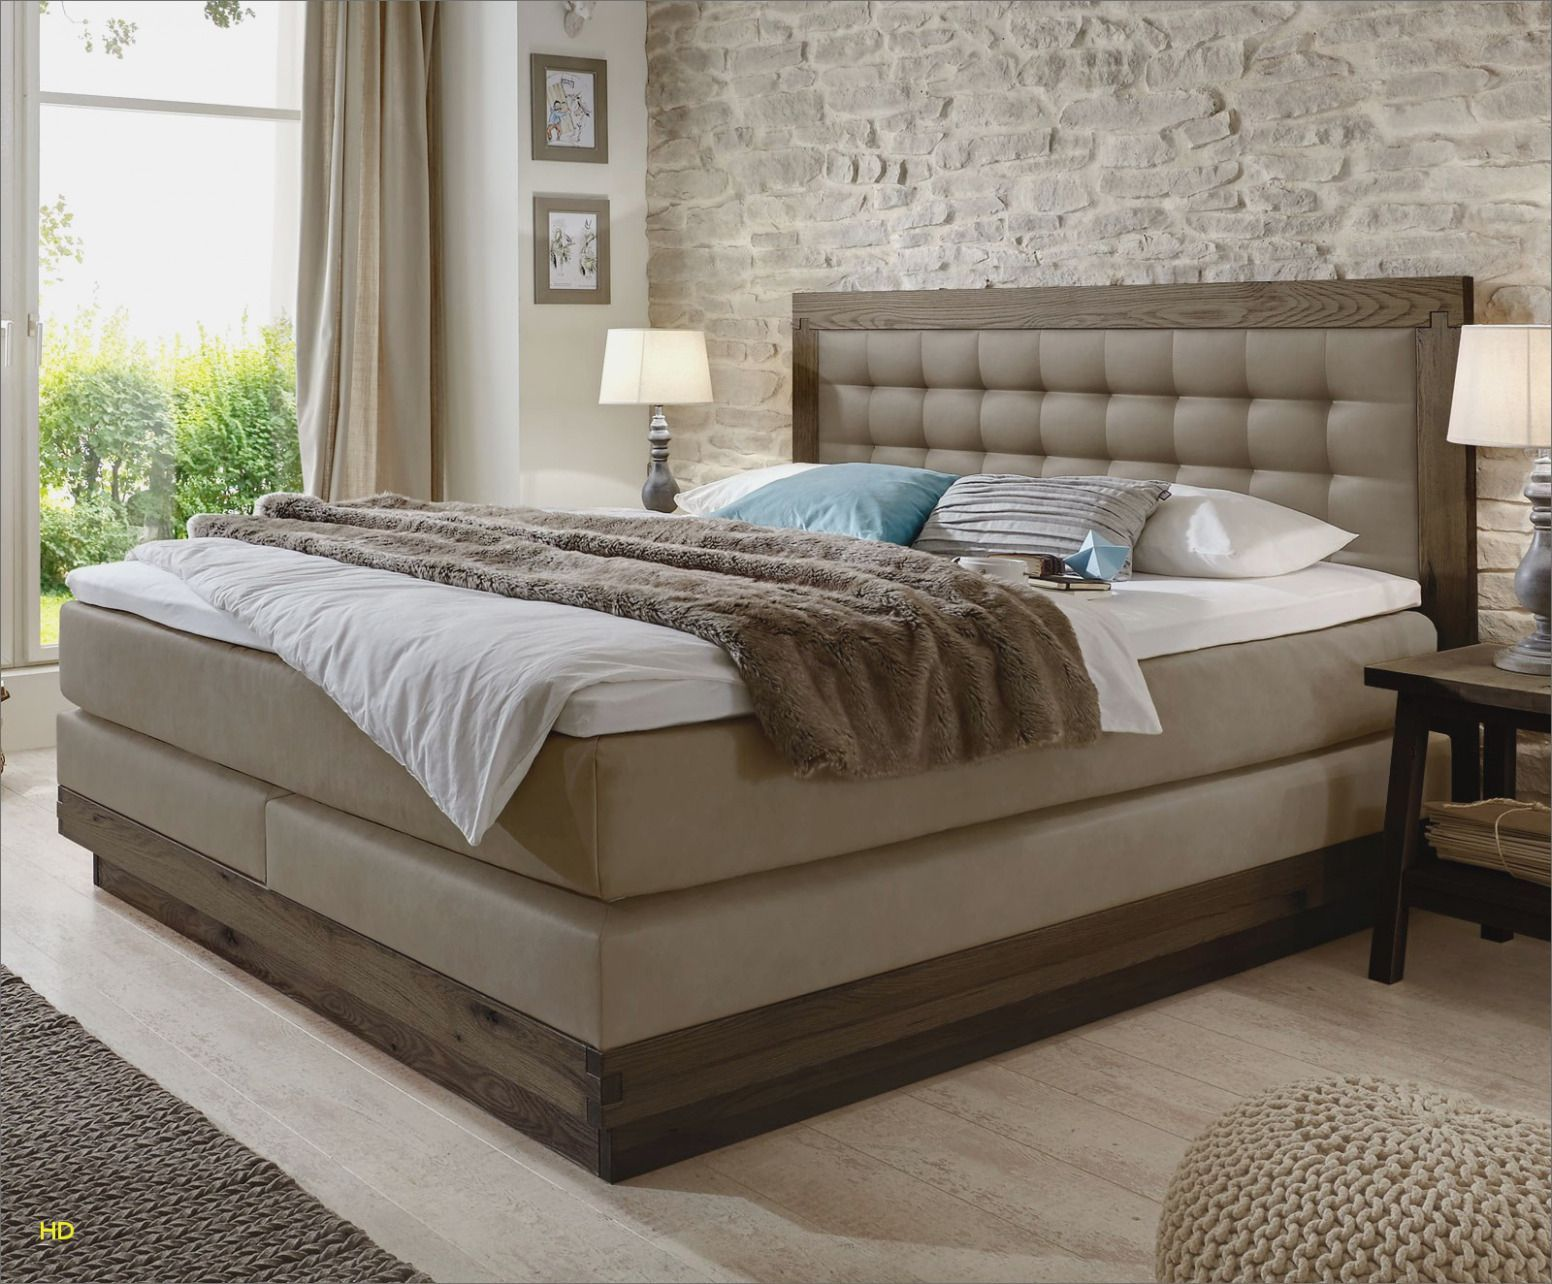 Schlafzimmer Komplett Bett 160×200 Schlafzimmer Komplett